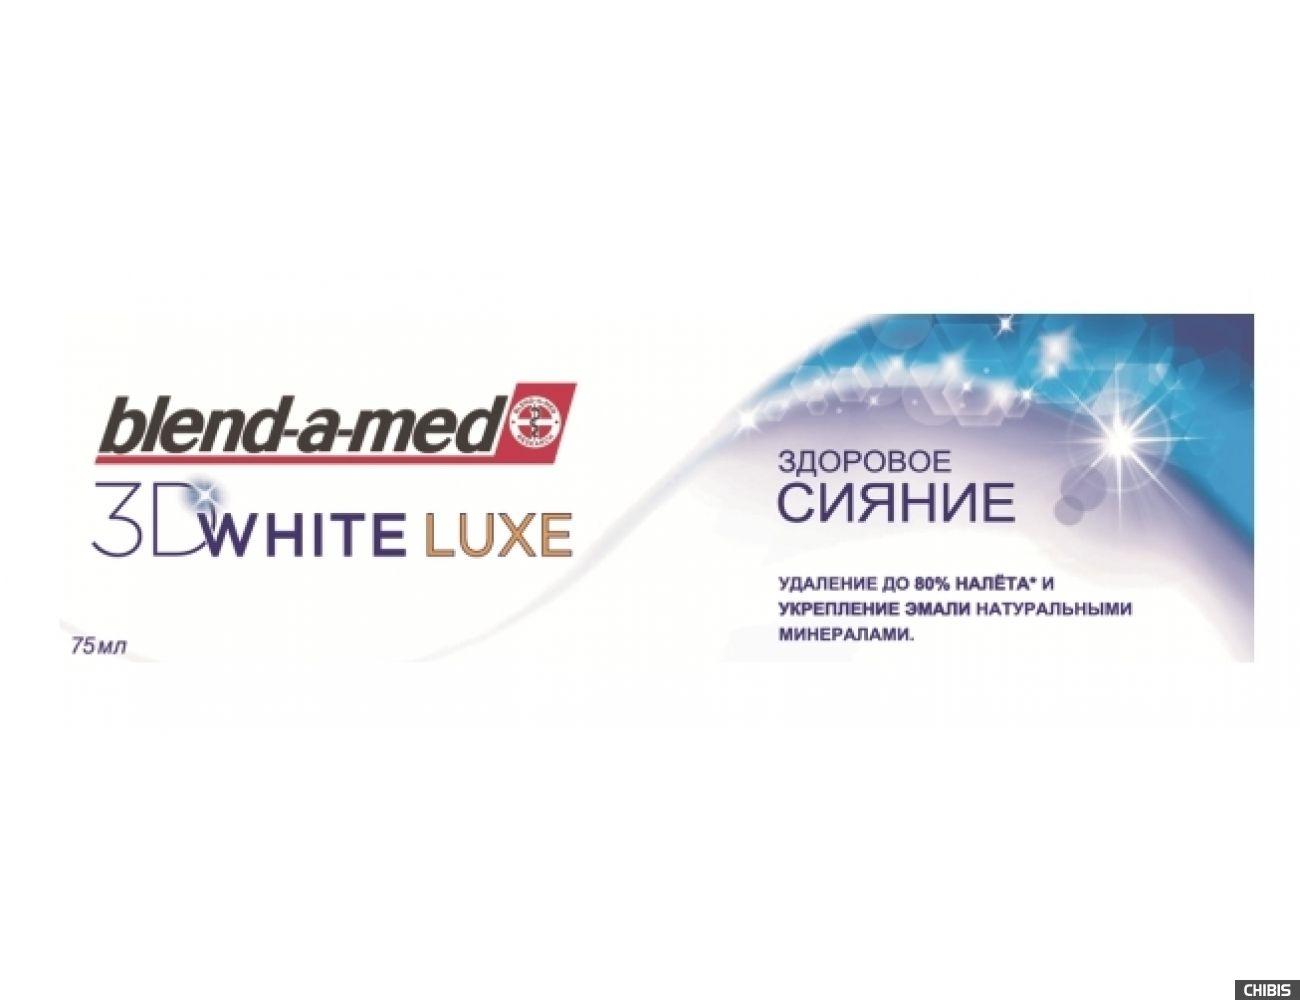 Зубная паста Blend-a-med 3D White LUXE Здоровое Сияние 75мл.(5013965968440)